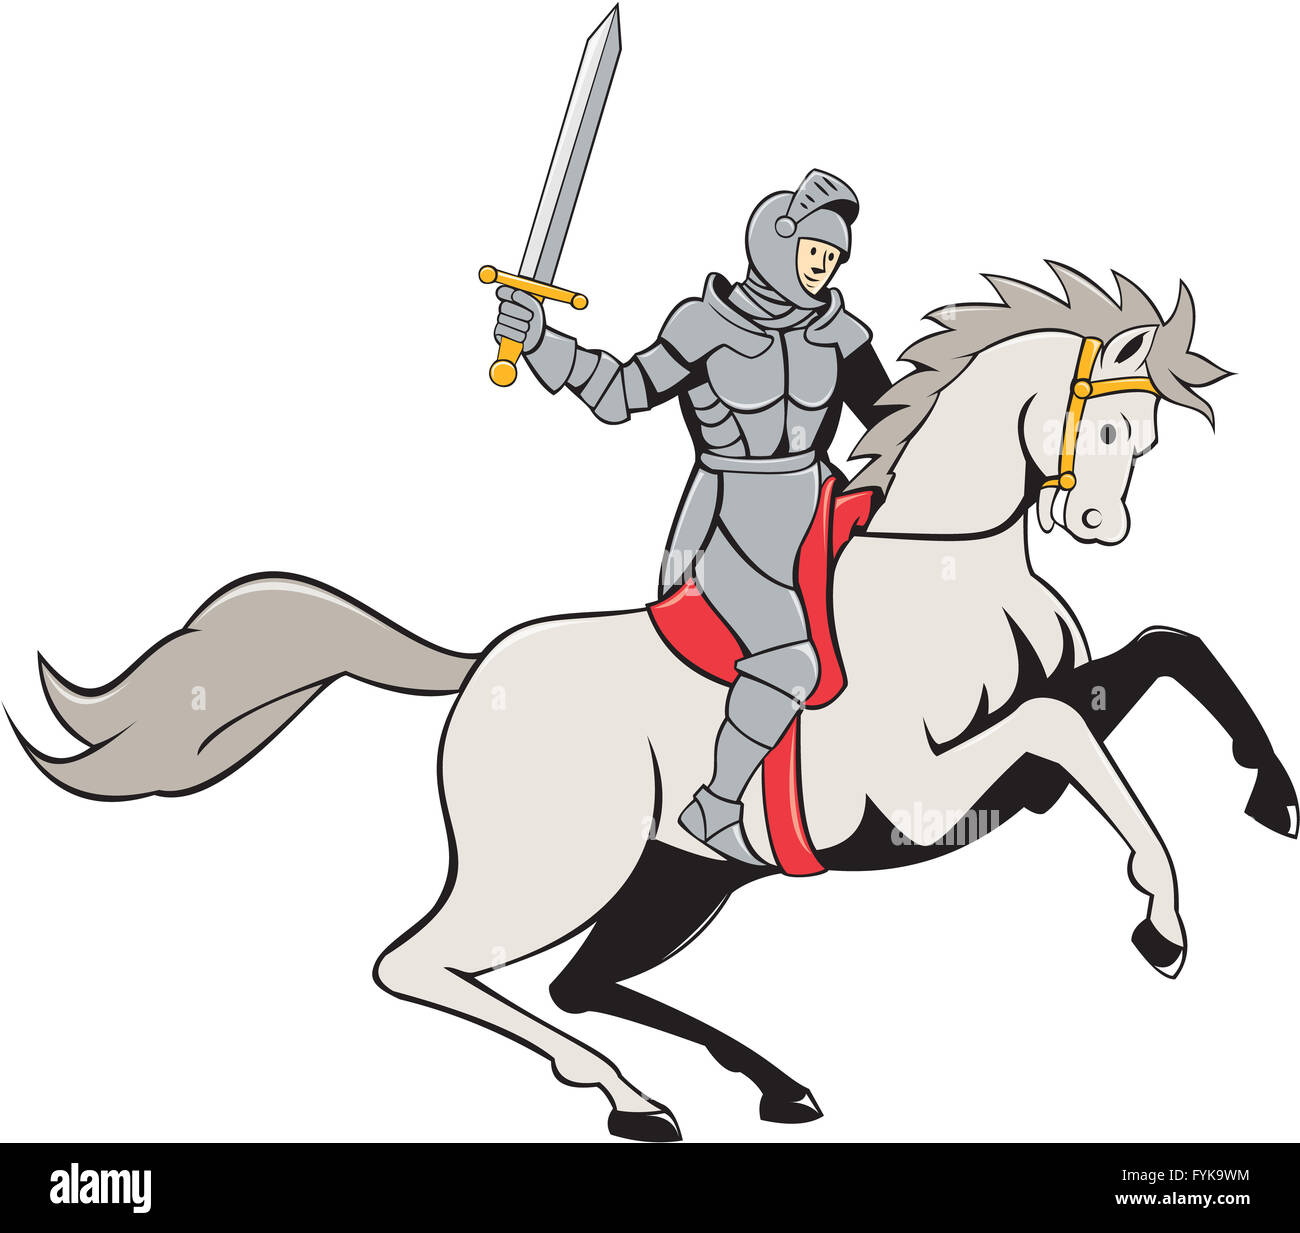 Cavaliere a cavallo spada Cartoon Immagini Stock